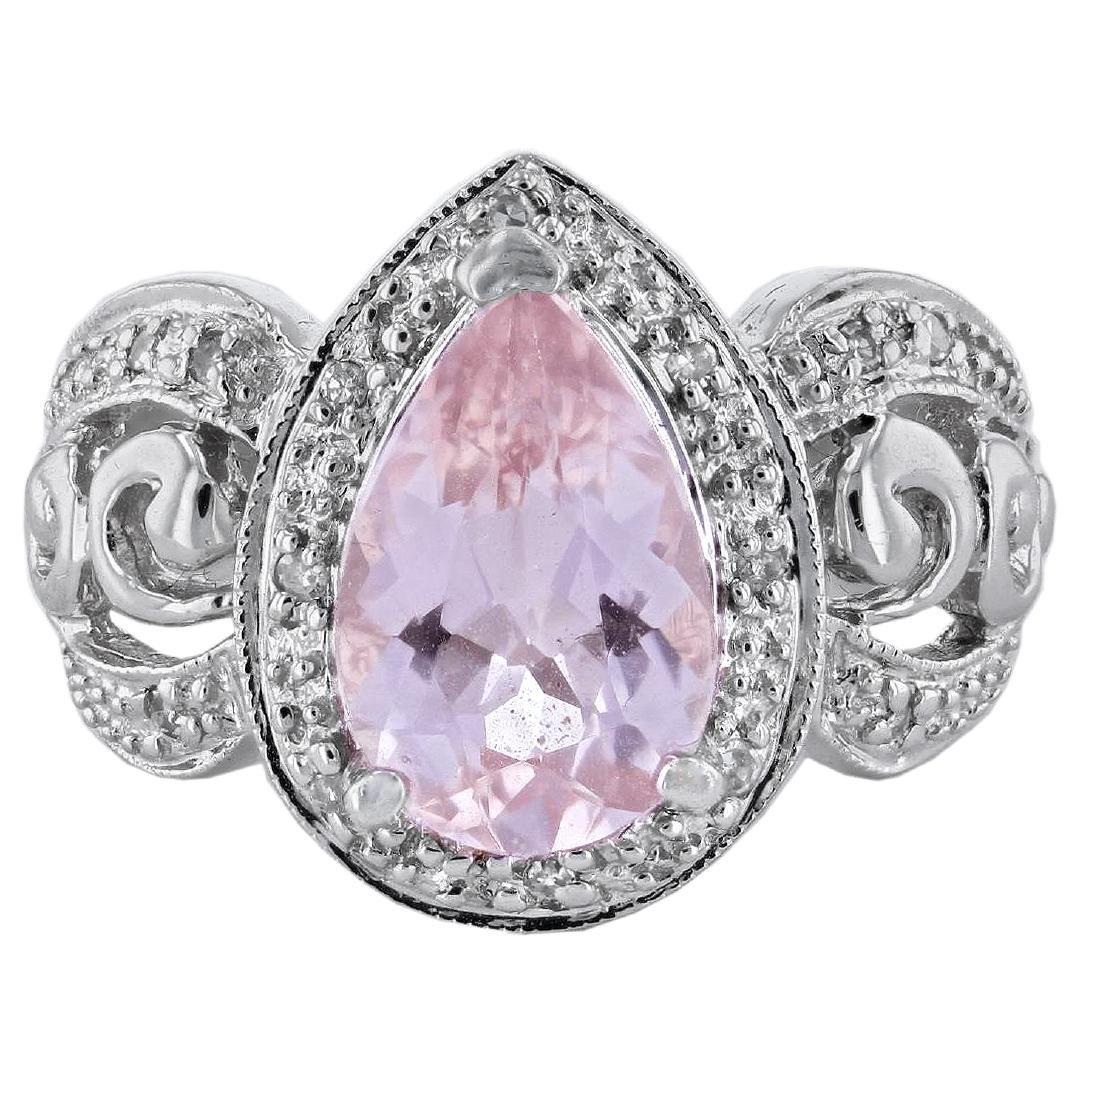 14KT White Gold 3.20ct Morganite and Diamond Ring